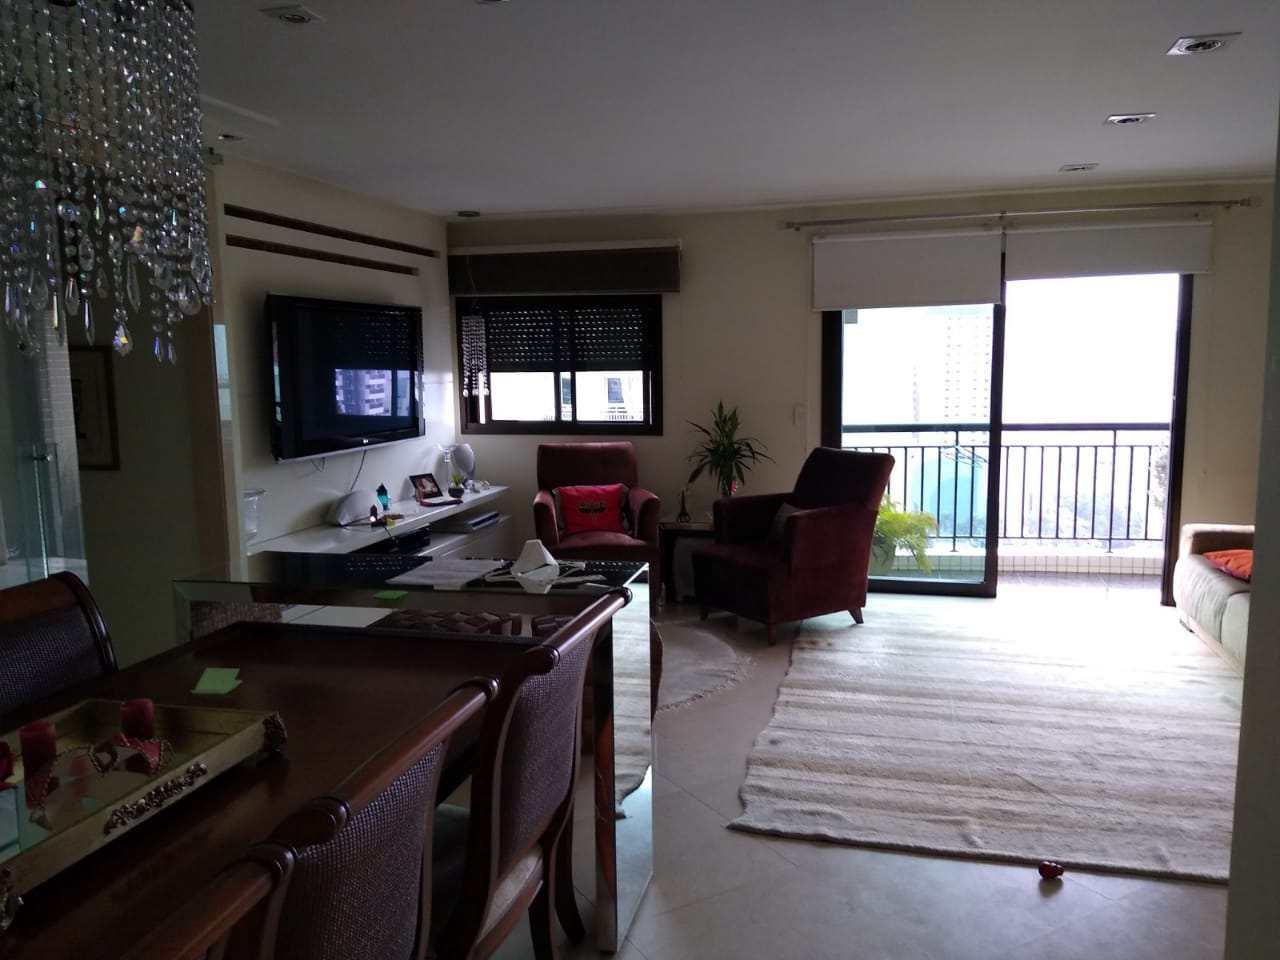 Apartamento com 3 dorms, Vila Gomes Cardim, São Paulo - R$ 1.19 mi, Cod: 3679